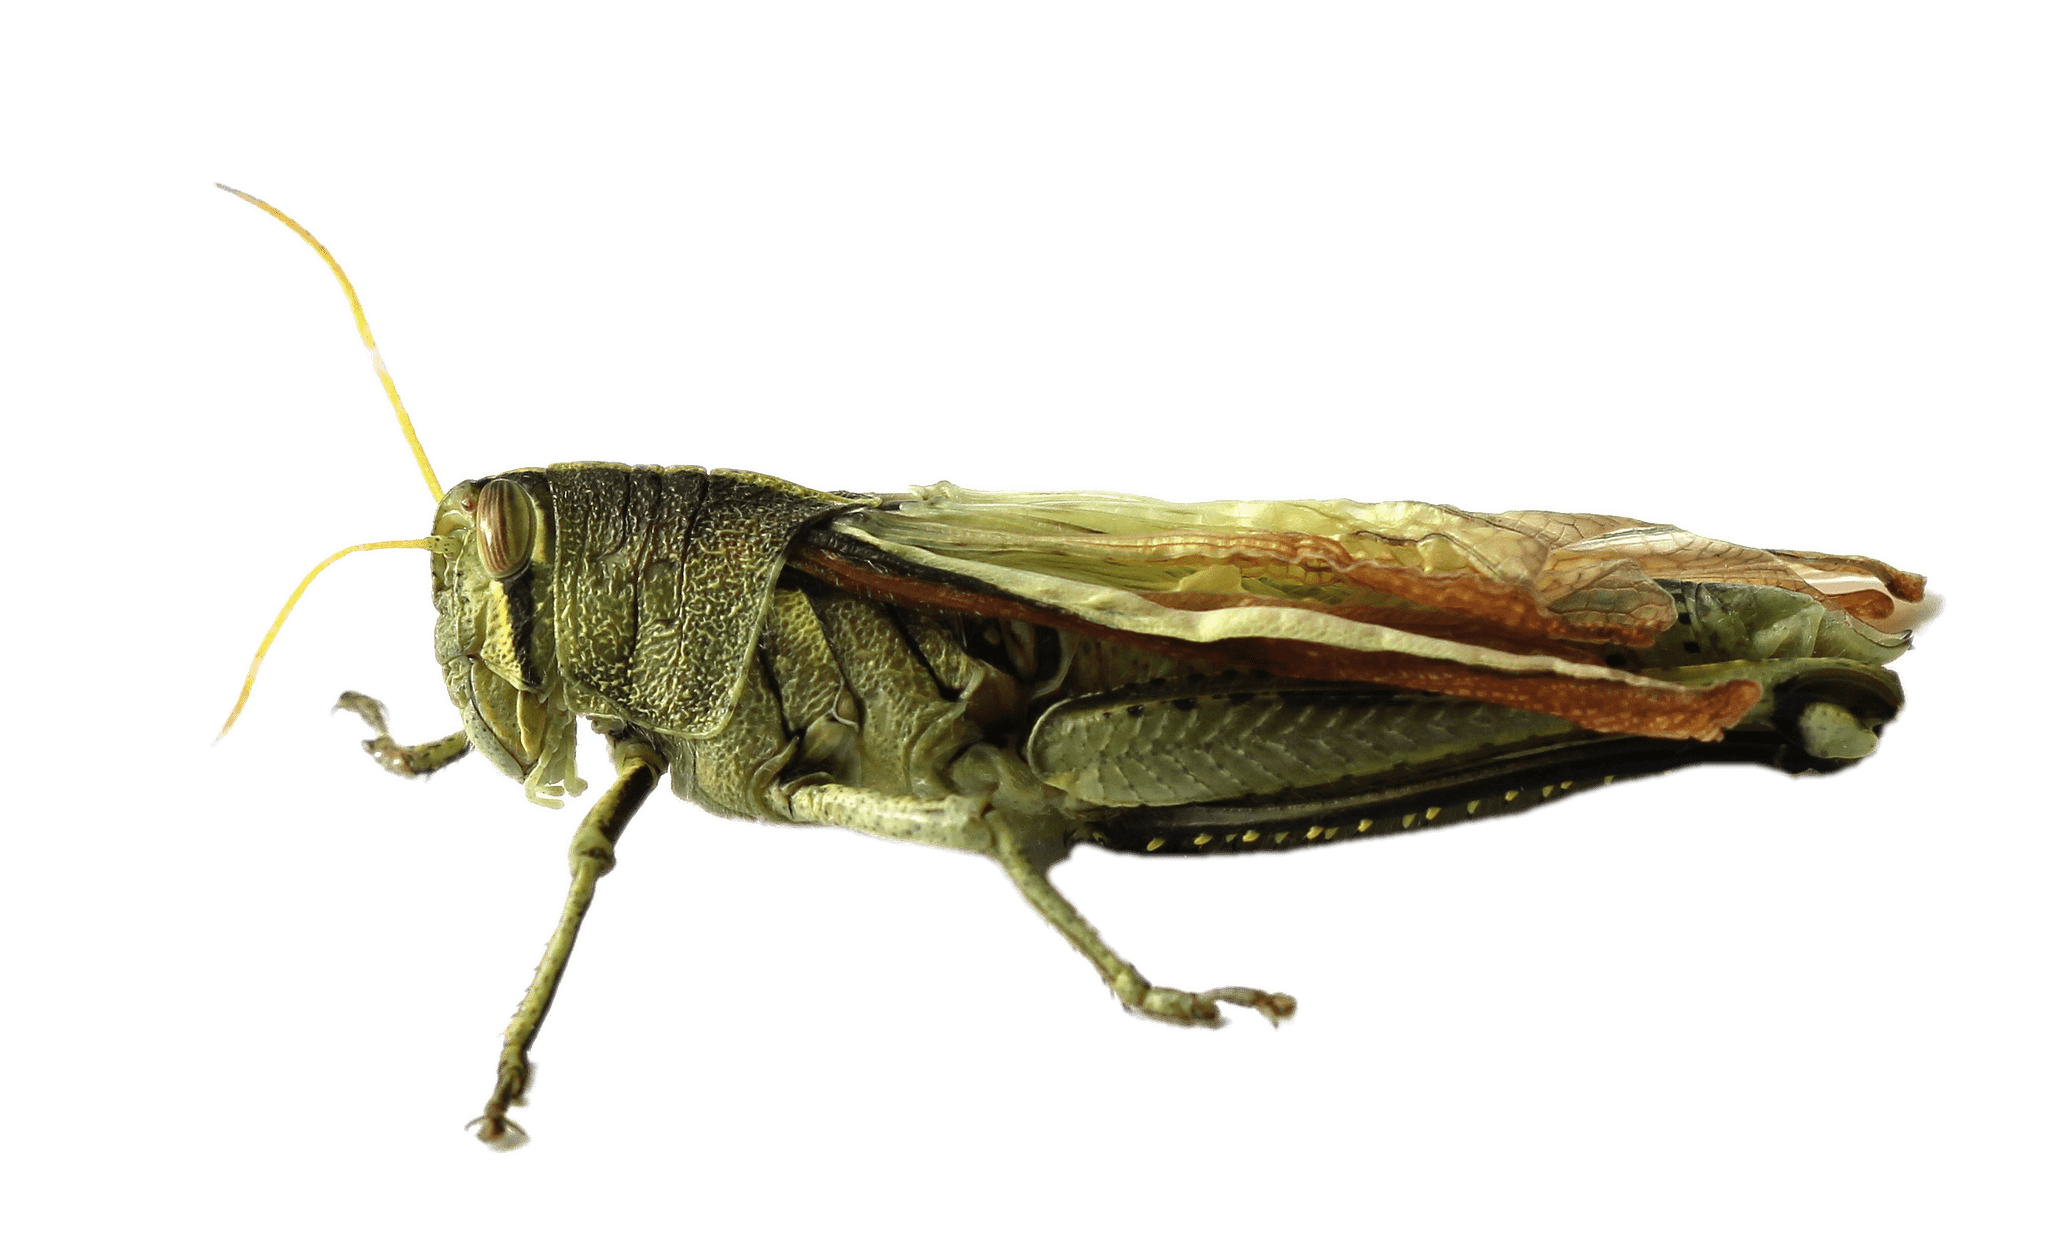 Grasshopper PNG - 28098